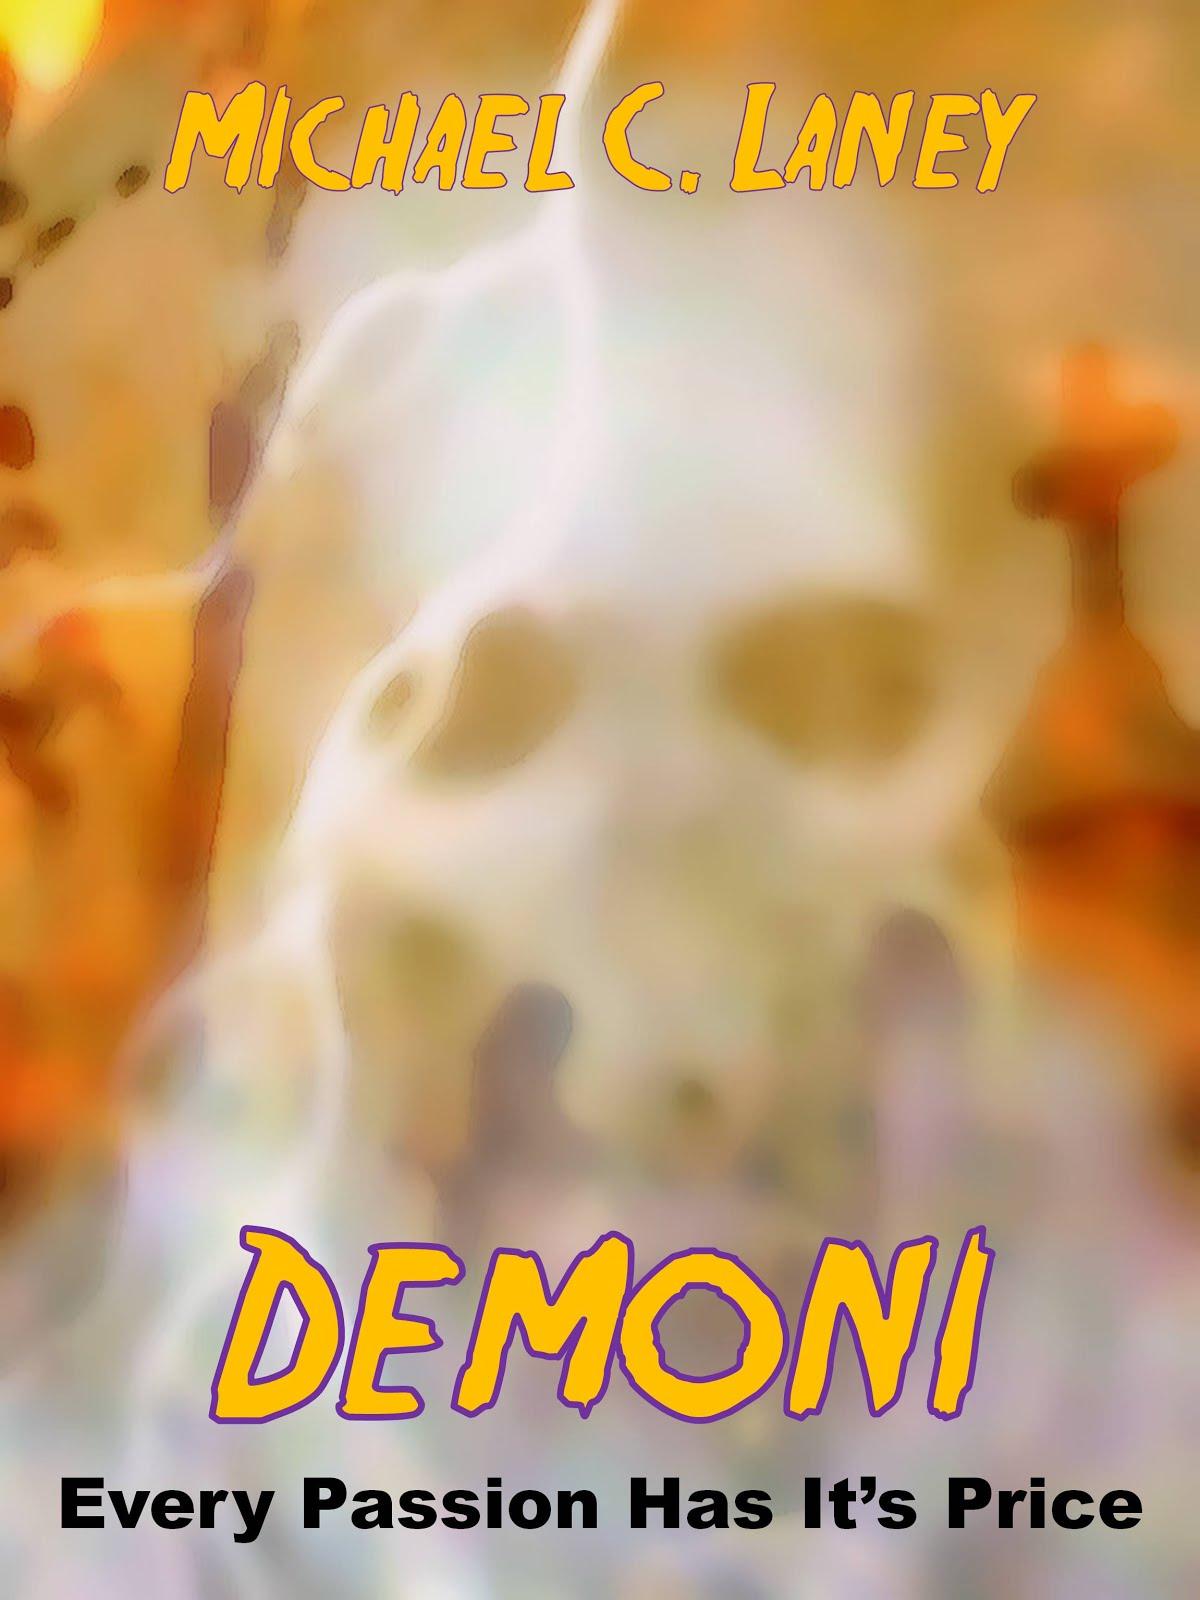 Demoni